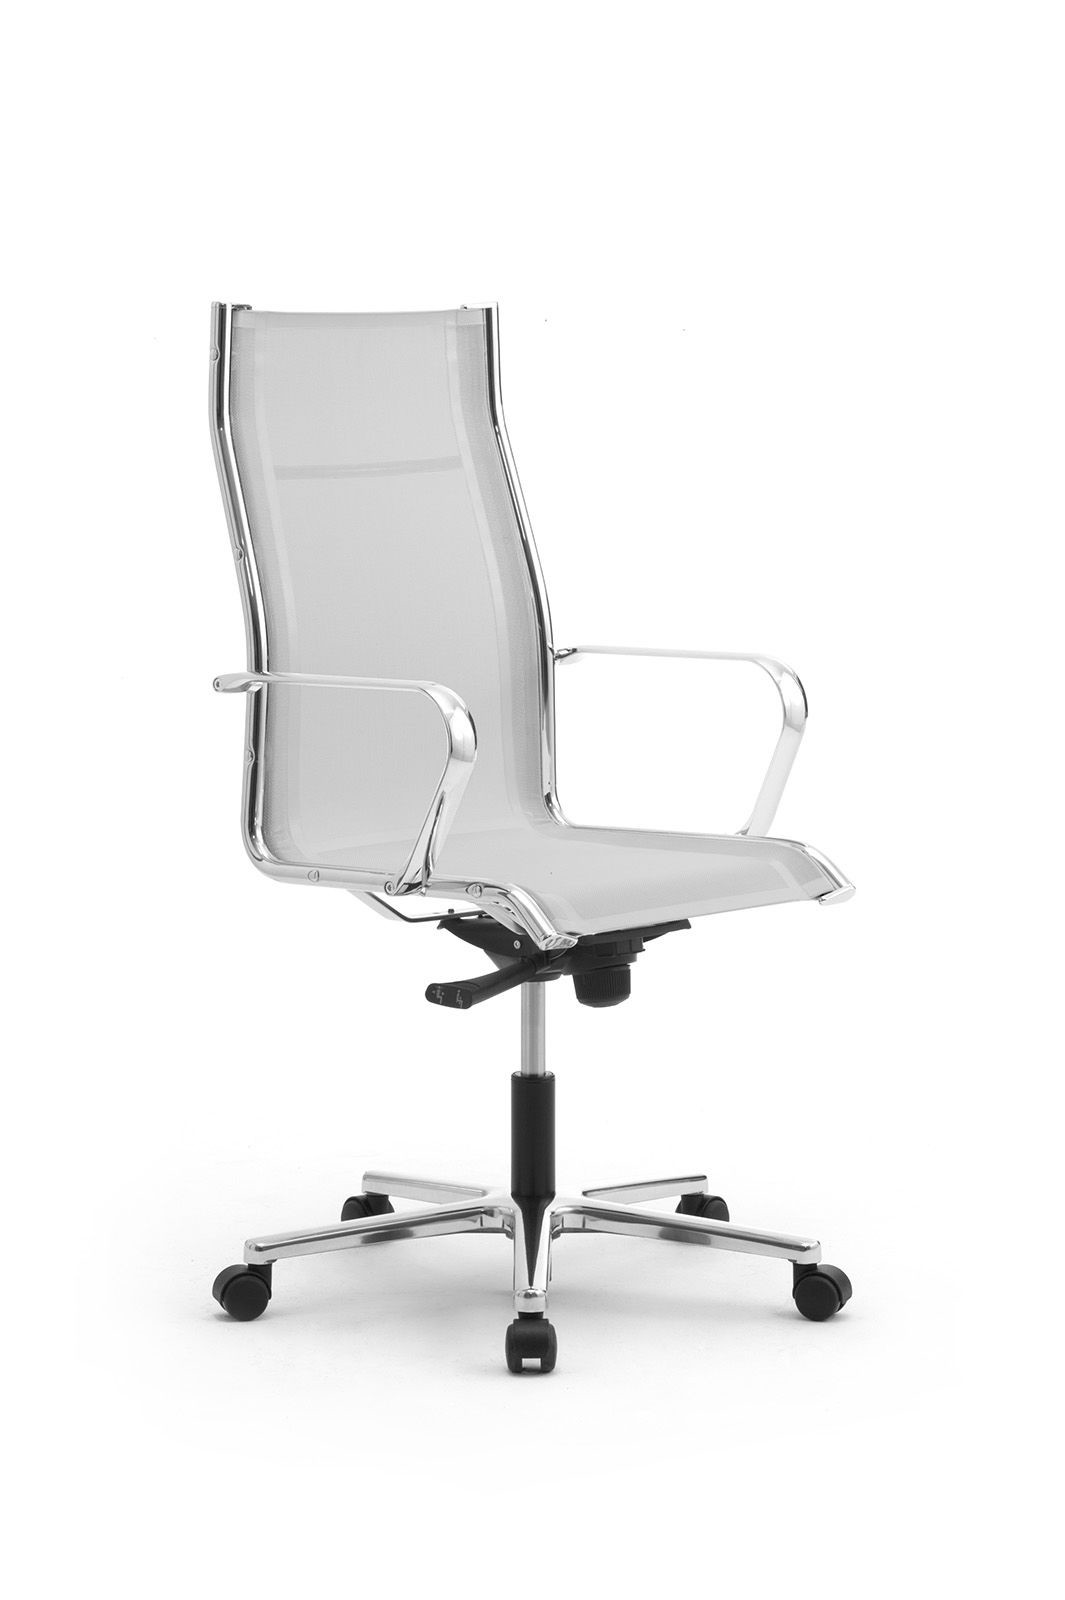 Origami RE high executive 70211, Silla de oficina con asiento y respaldo hecha de malla